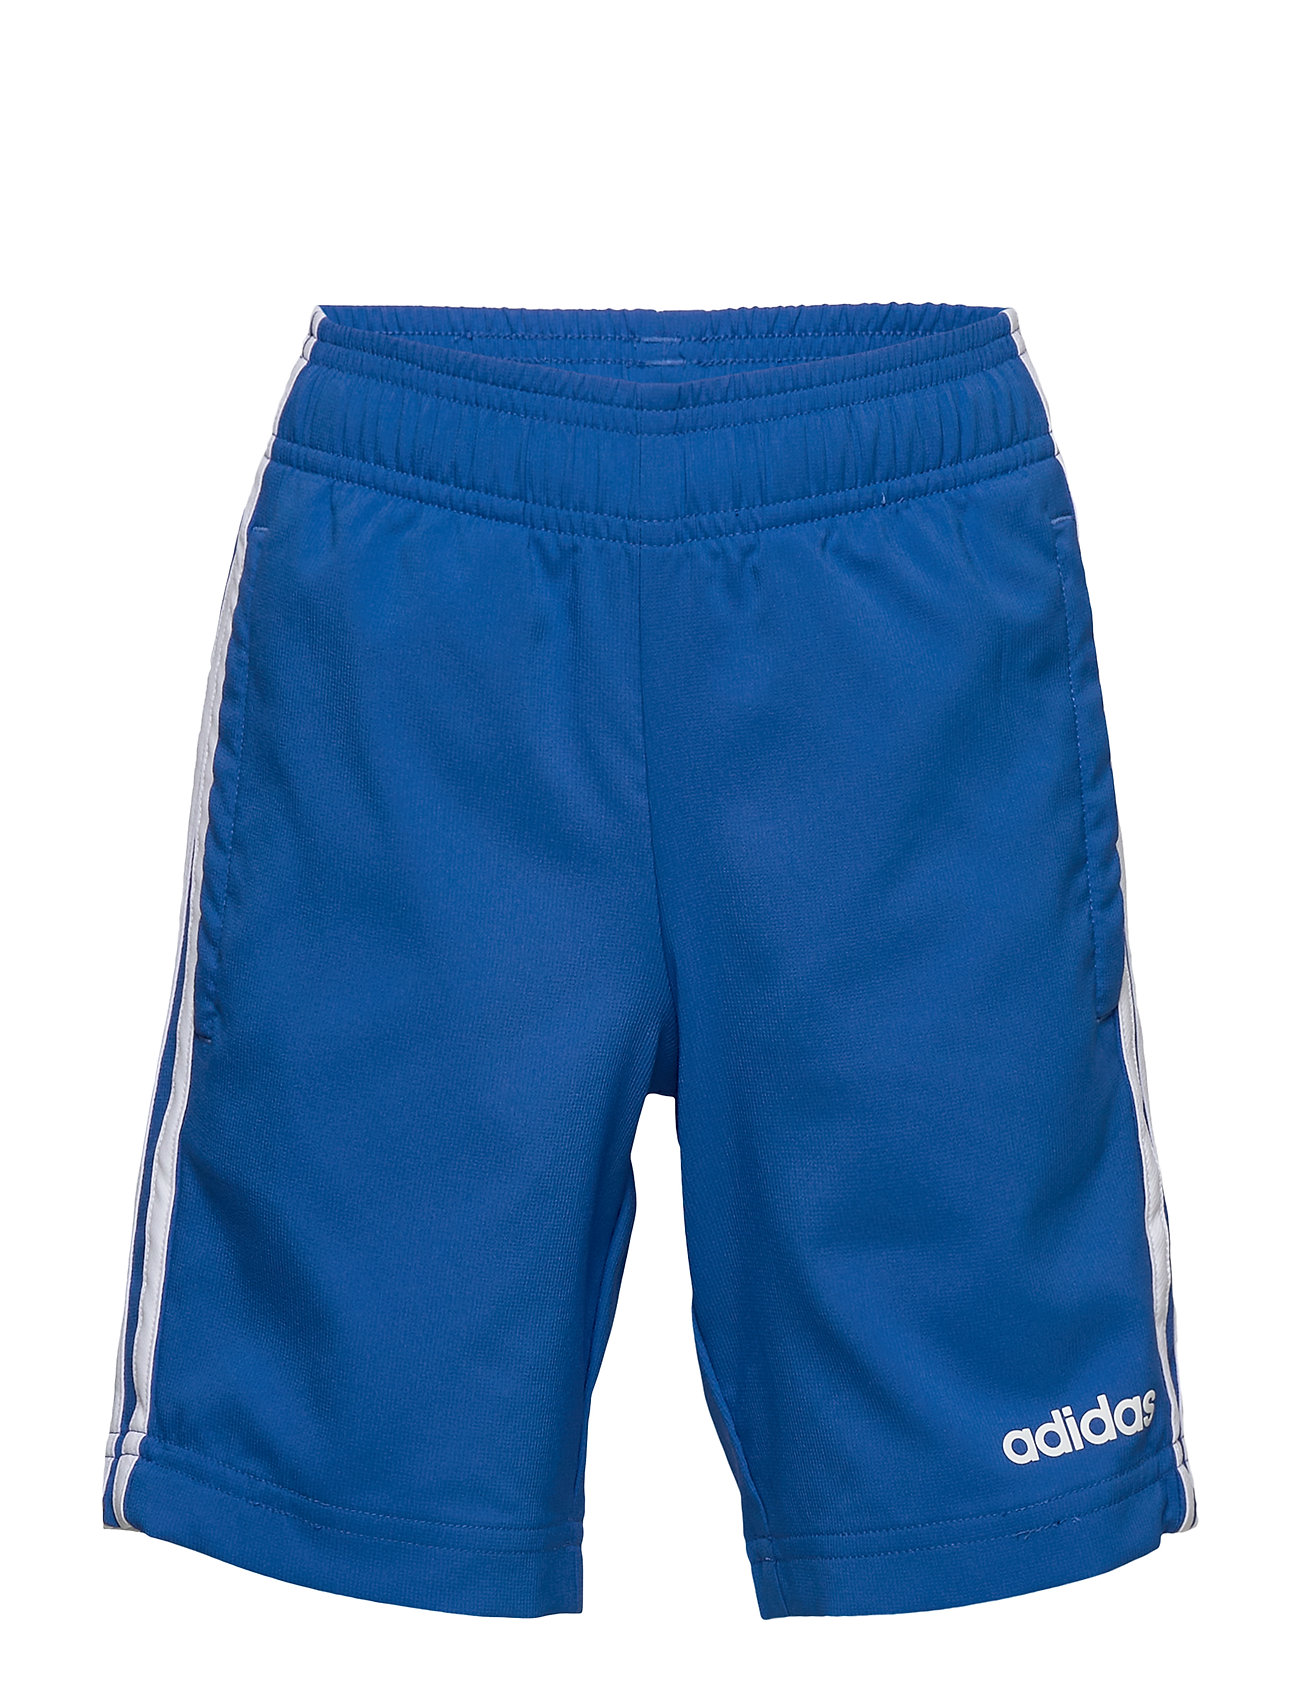 Image of Yb E 3s Wv Sh Shorts Blå Adidas Performance (3418622183)